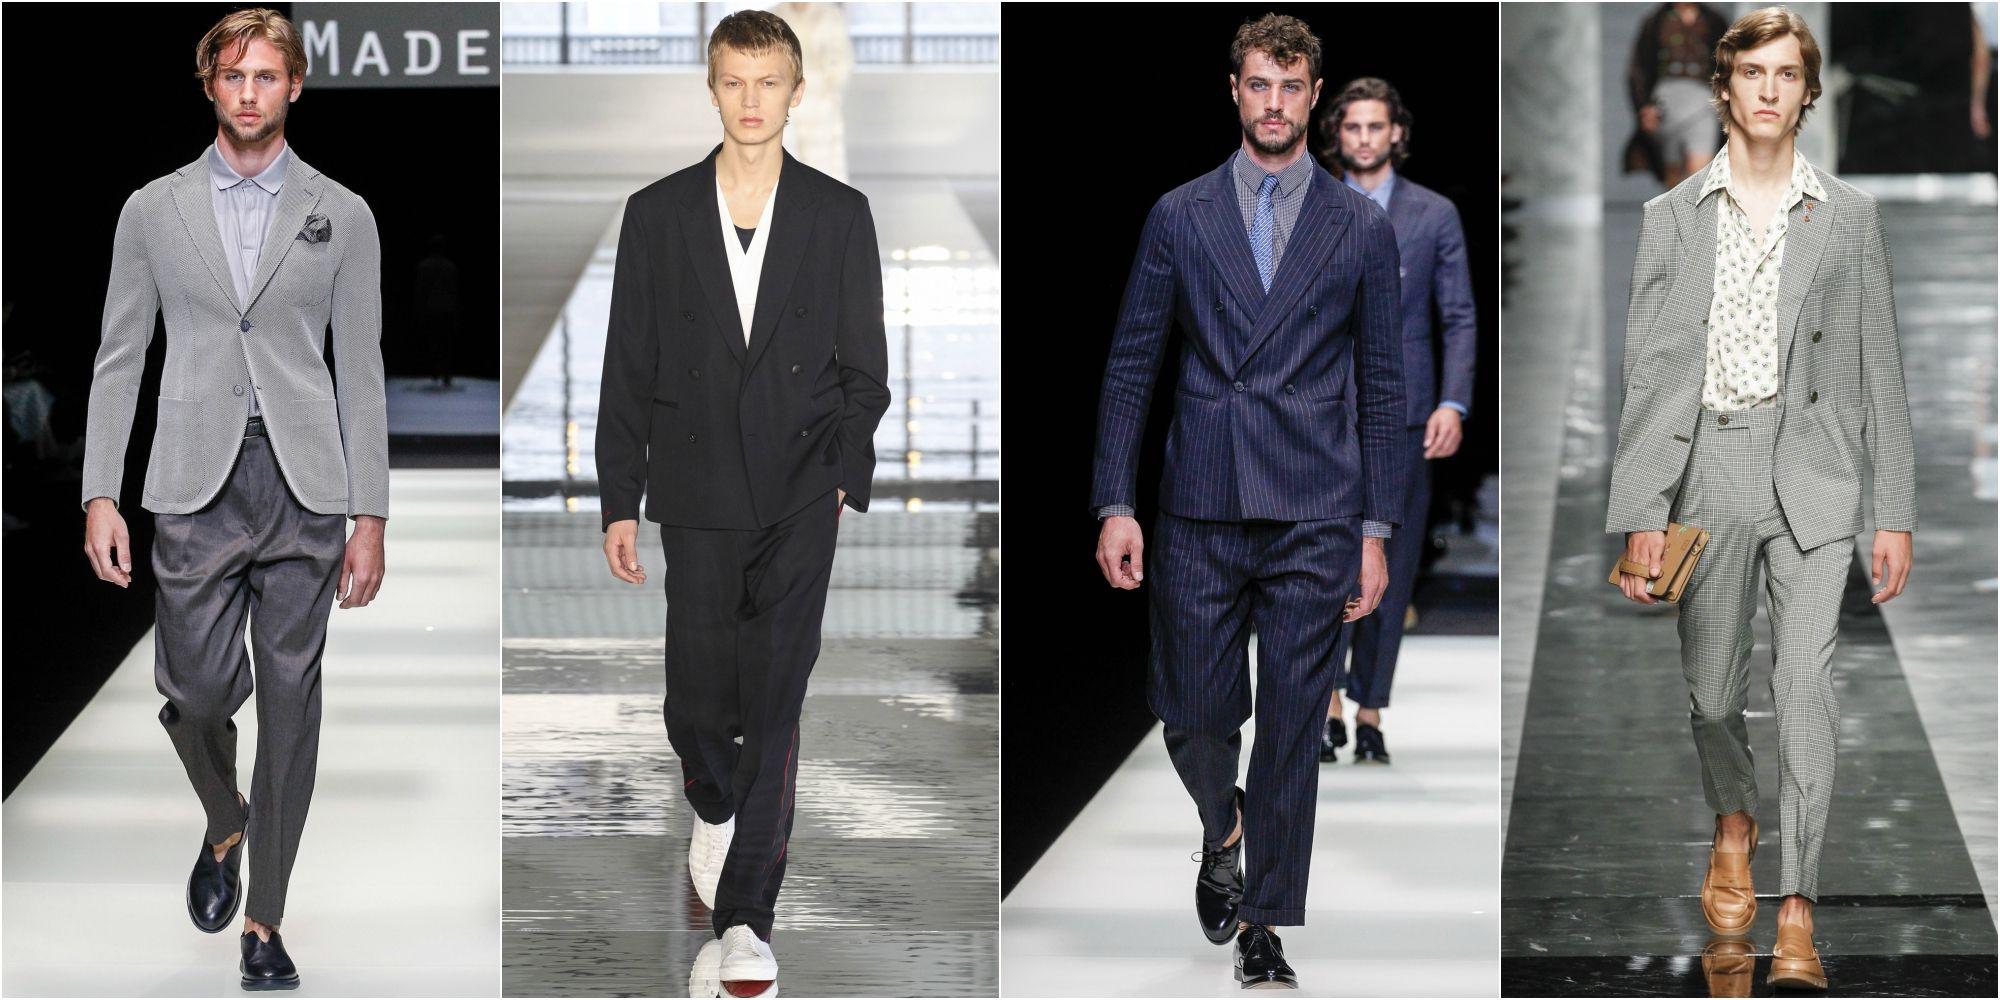 84fd6442cd68 Vestiti eleganti uomo: 6 outfit moda estate 2018